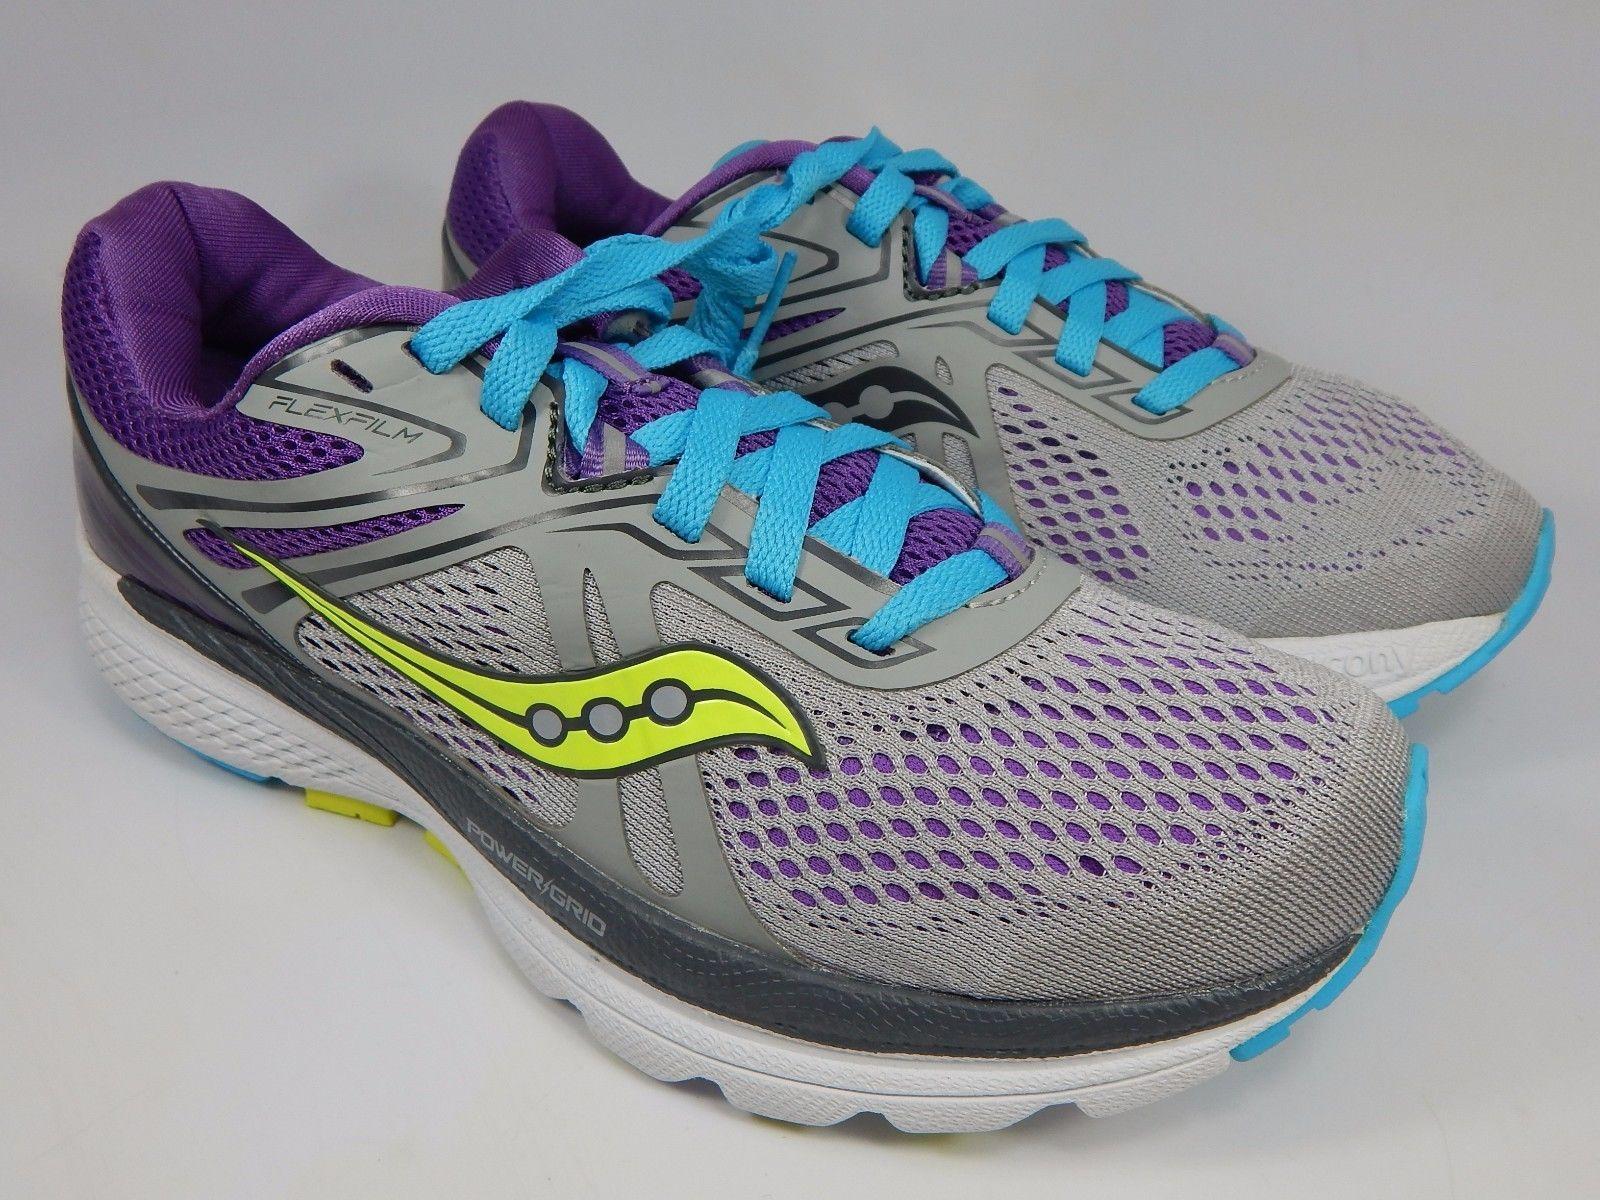 Saucony Swerve Women's Running Shoes Size US 8 M (B) EU 39 Gray Purple S10329-1